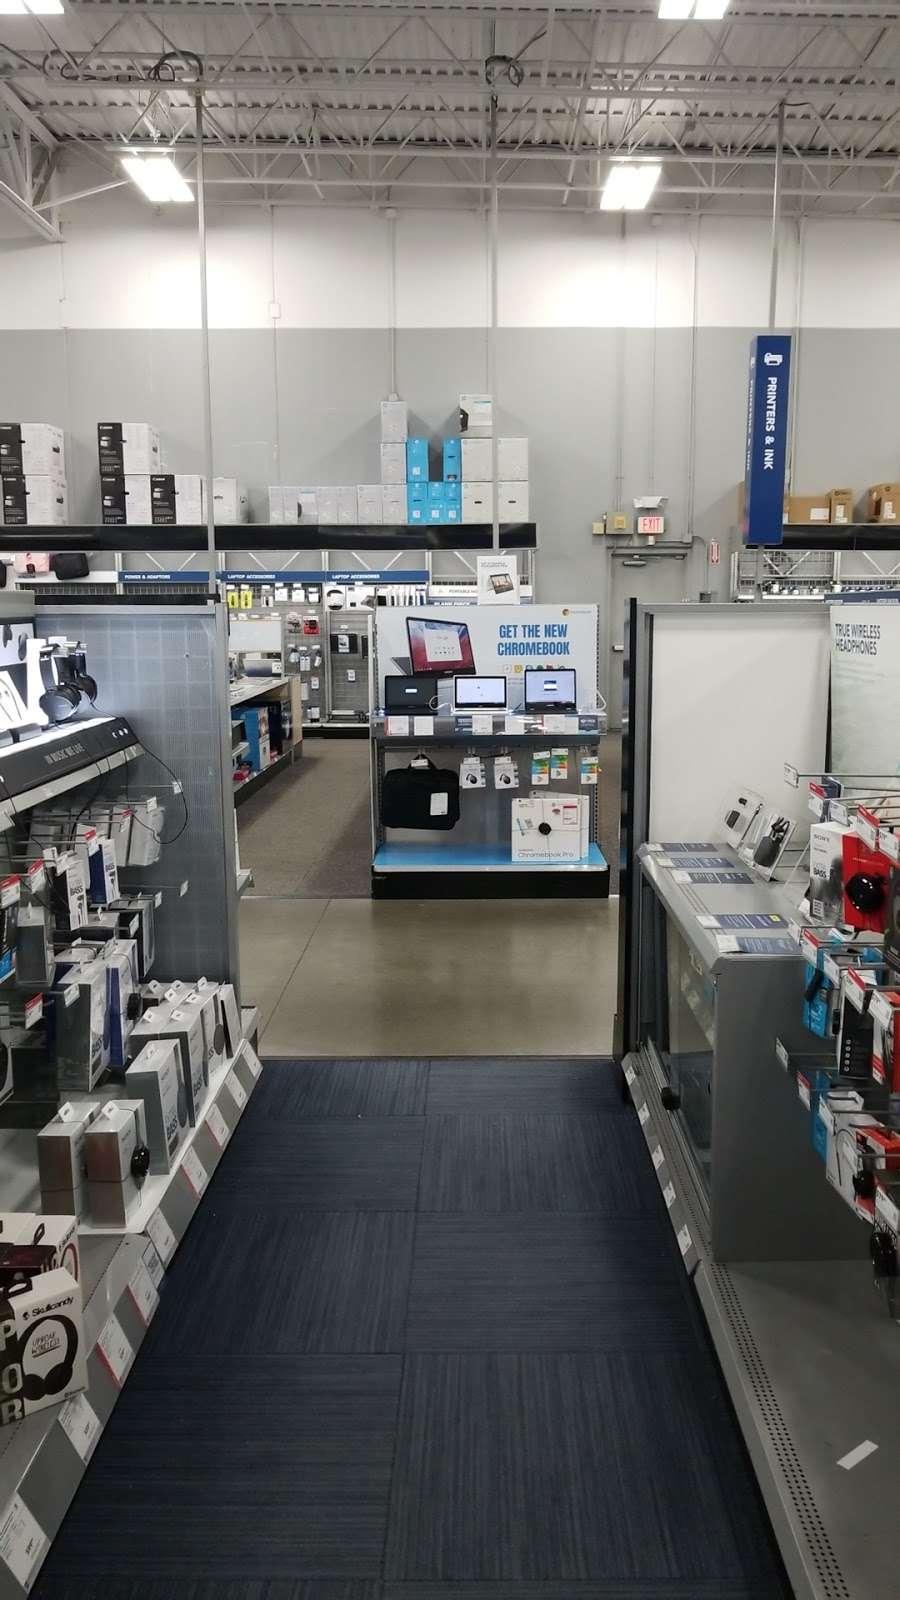 Best Buy - electronics store  | Photo 3 of 10 | Address: 3849 S Delsea Dr, Vineland, NJ 08360, USA | Phone: (856) 765-1880